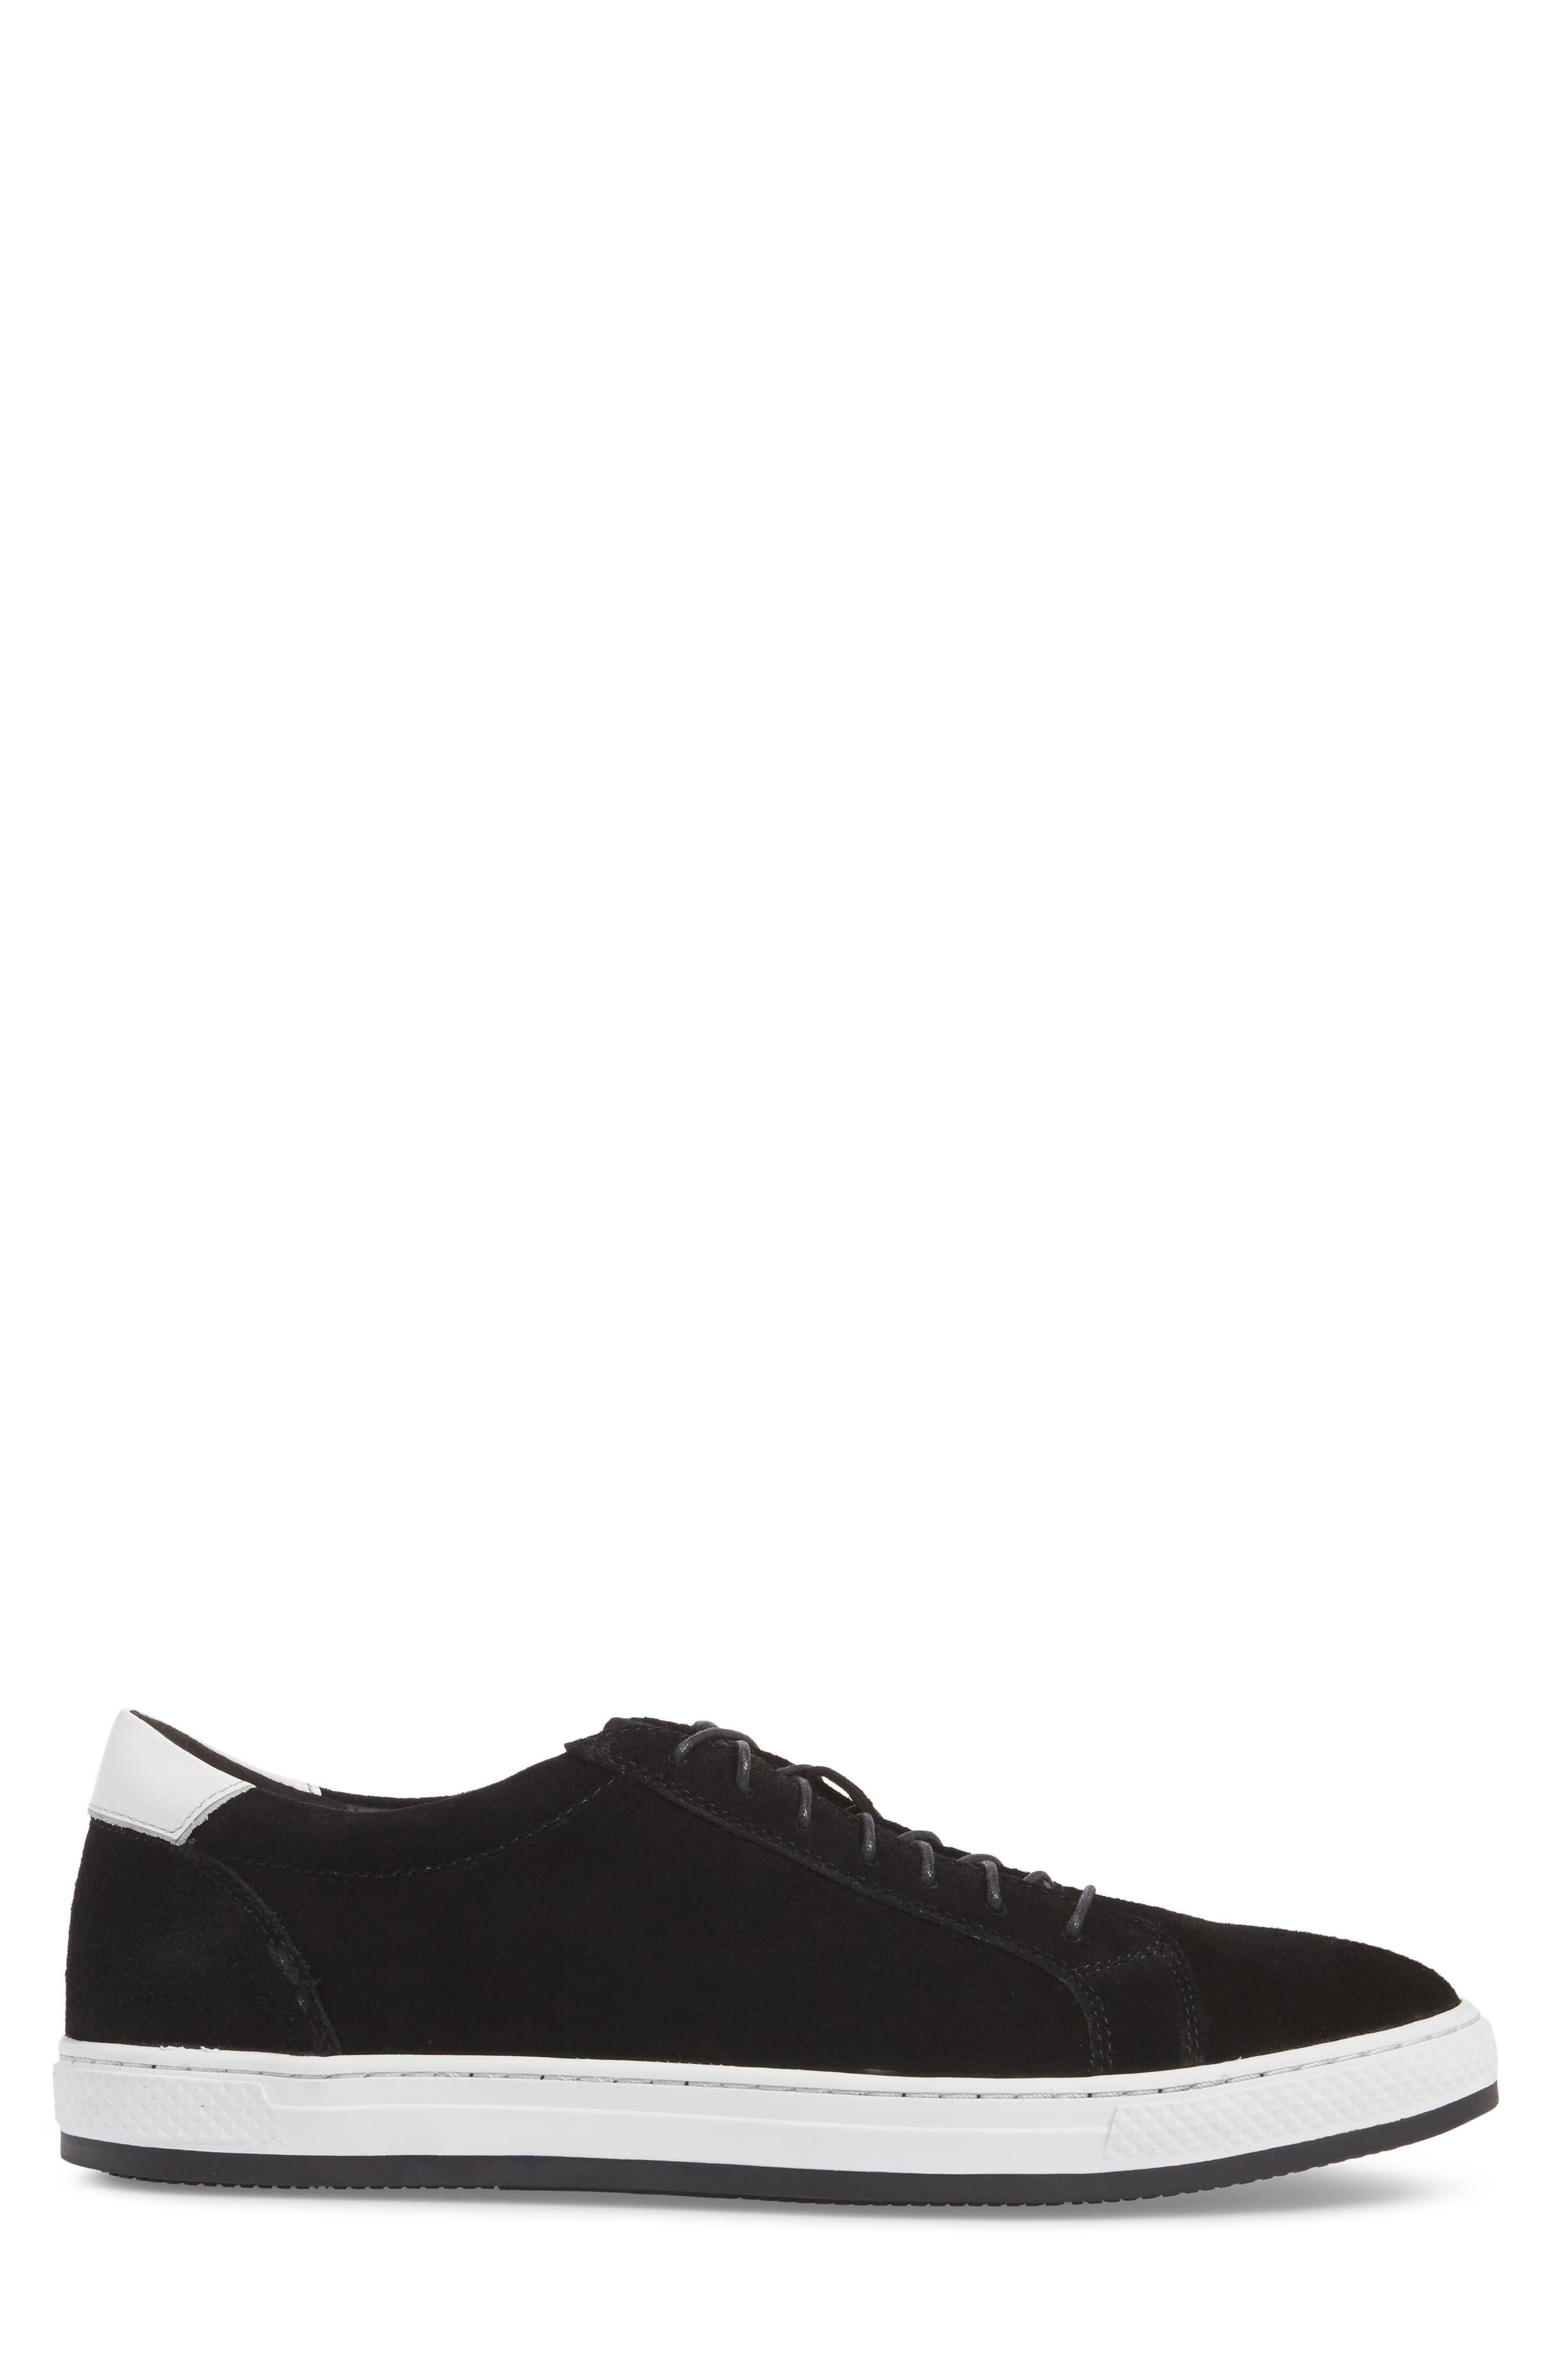 Queens Sneaker,                             Alternate thumbnail 3, color,                             001